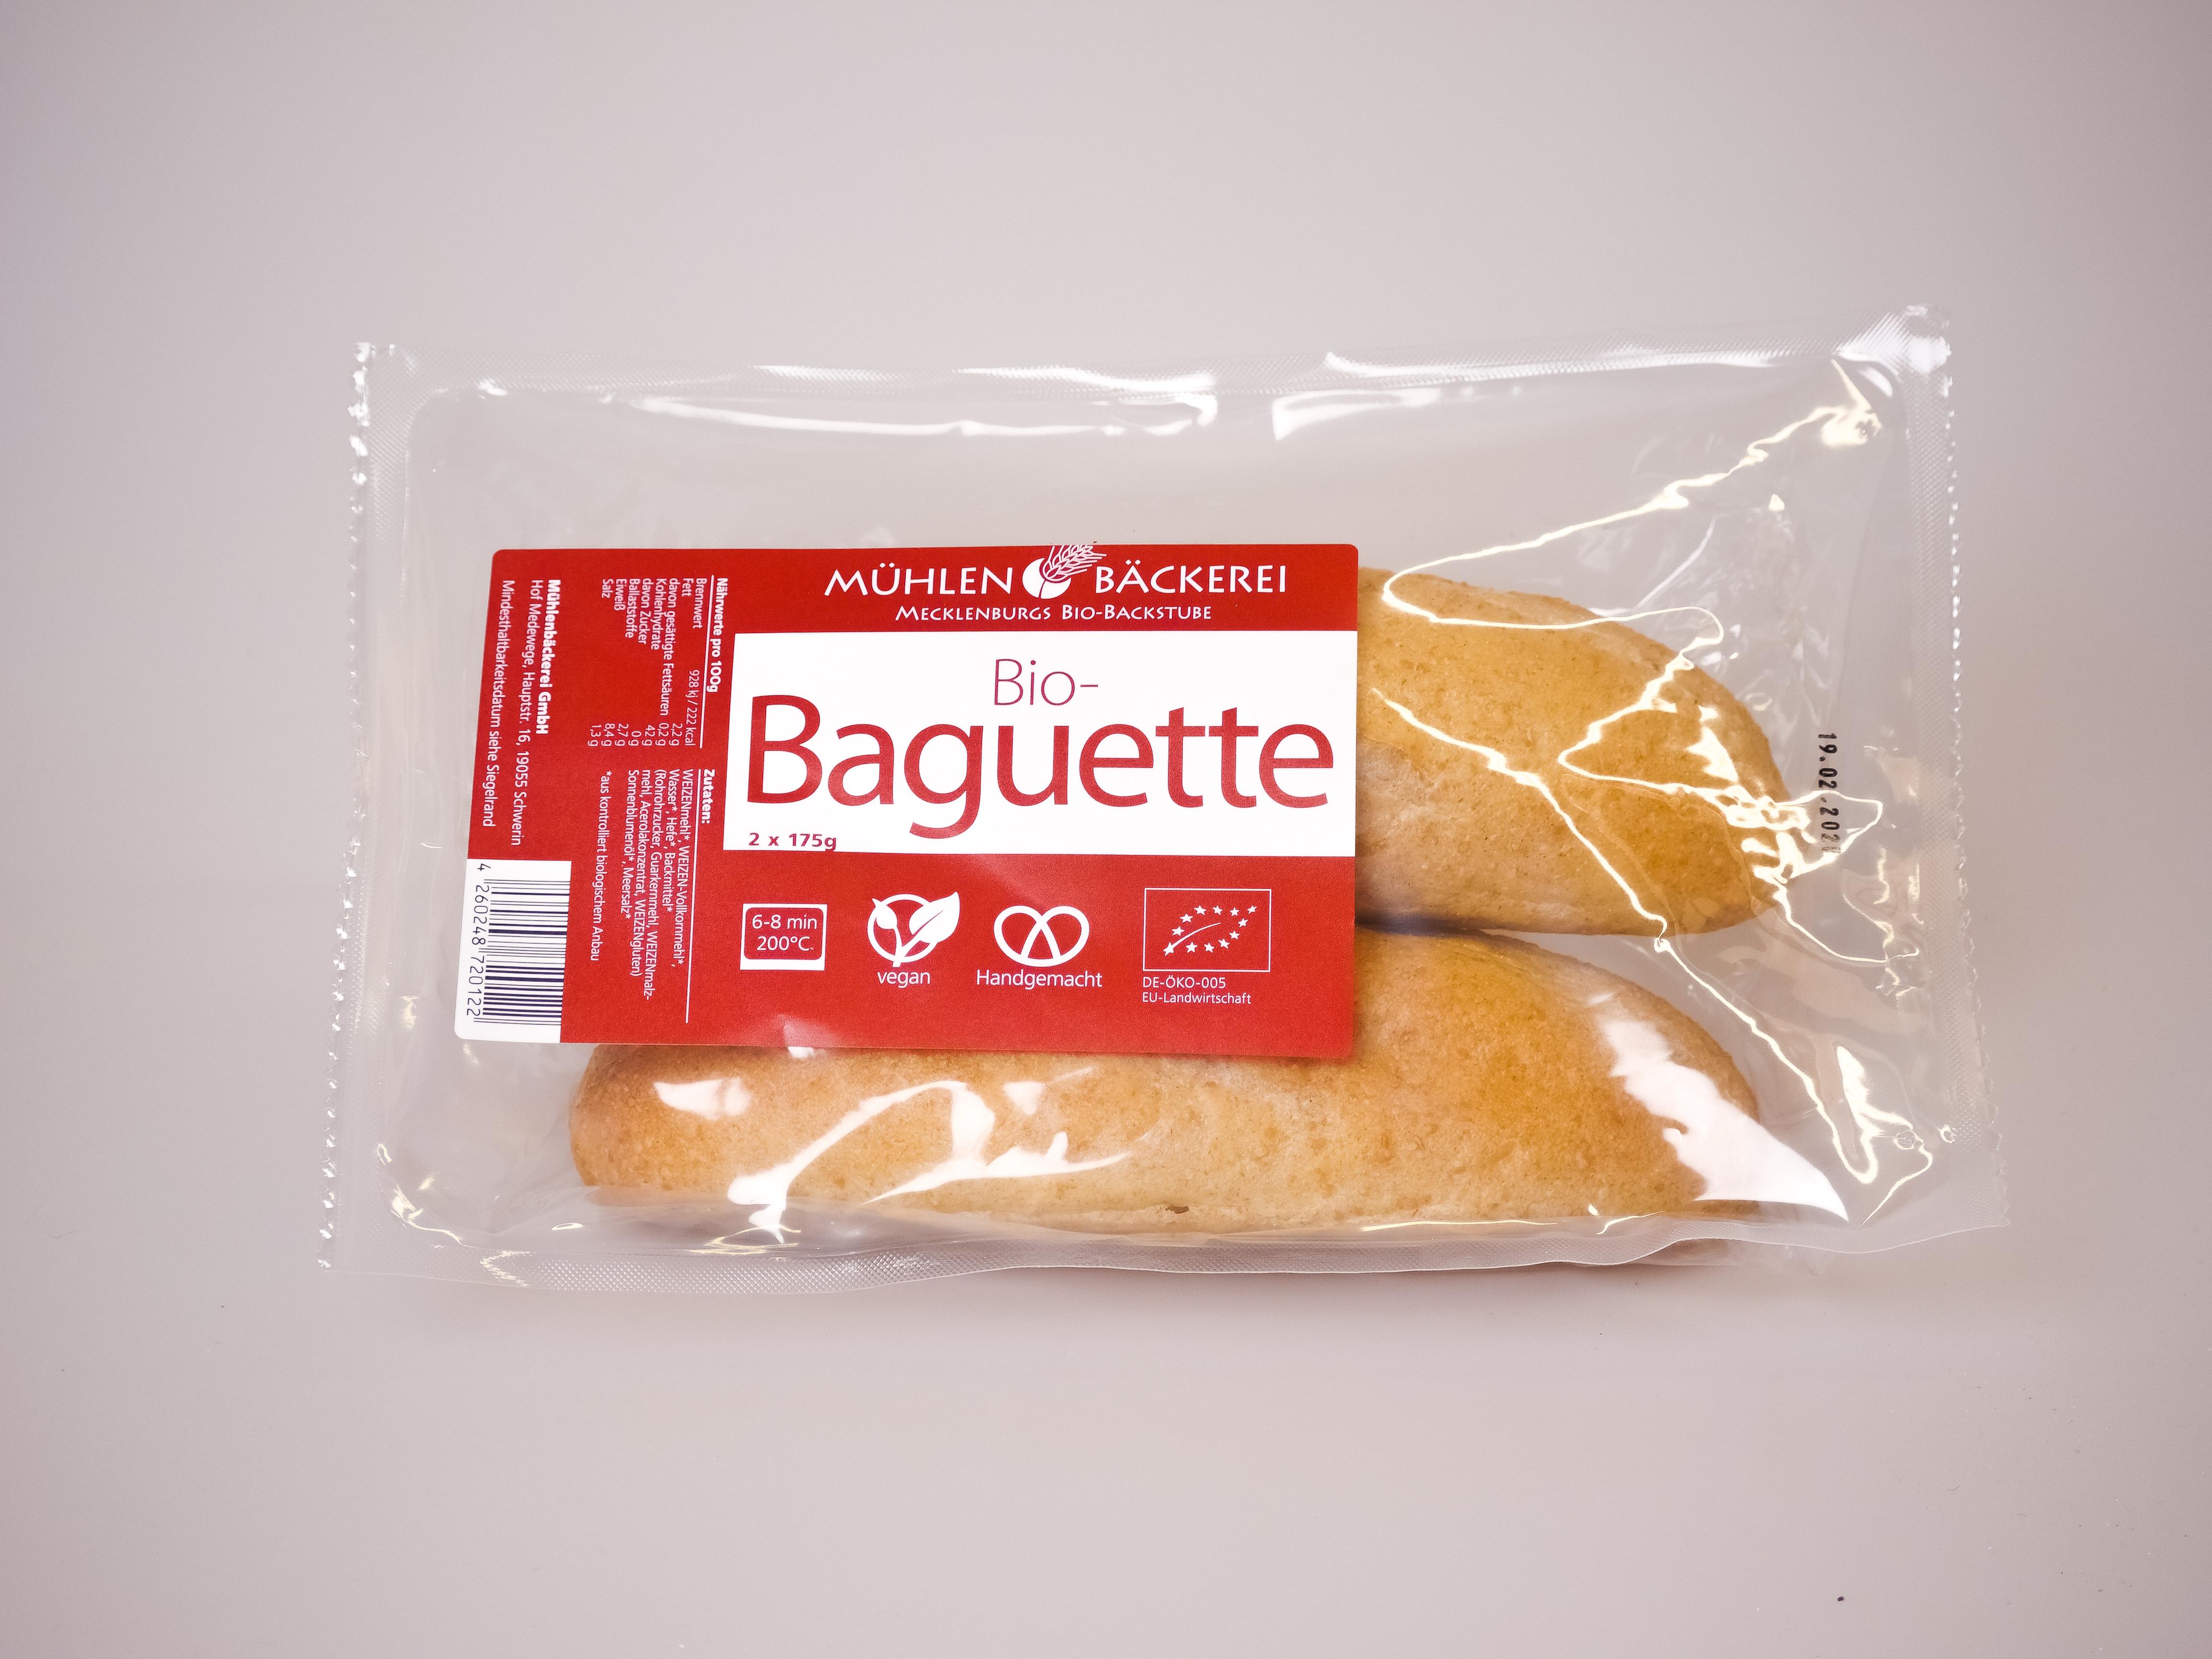 Baguette-Zwillinge zum Aufbacken